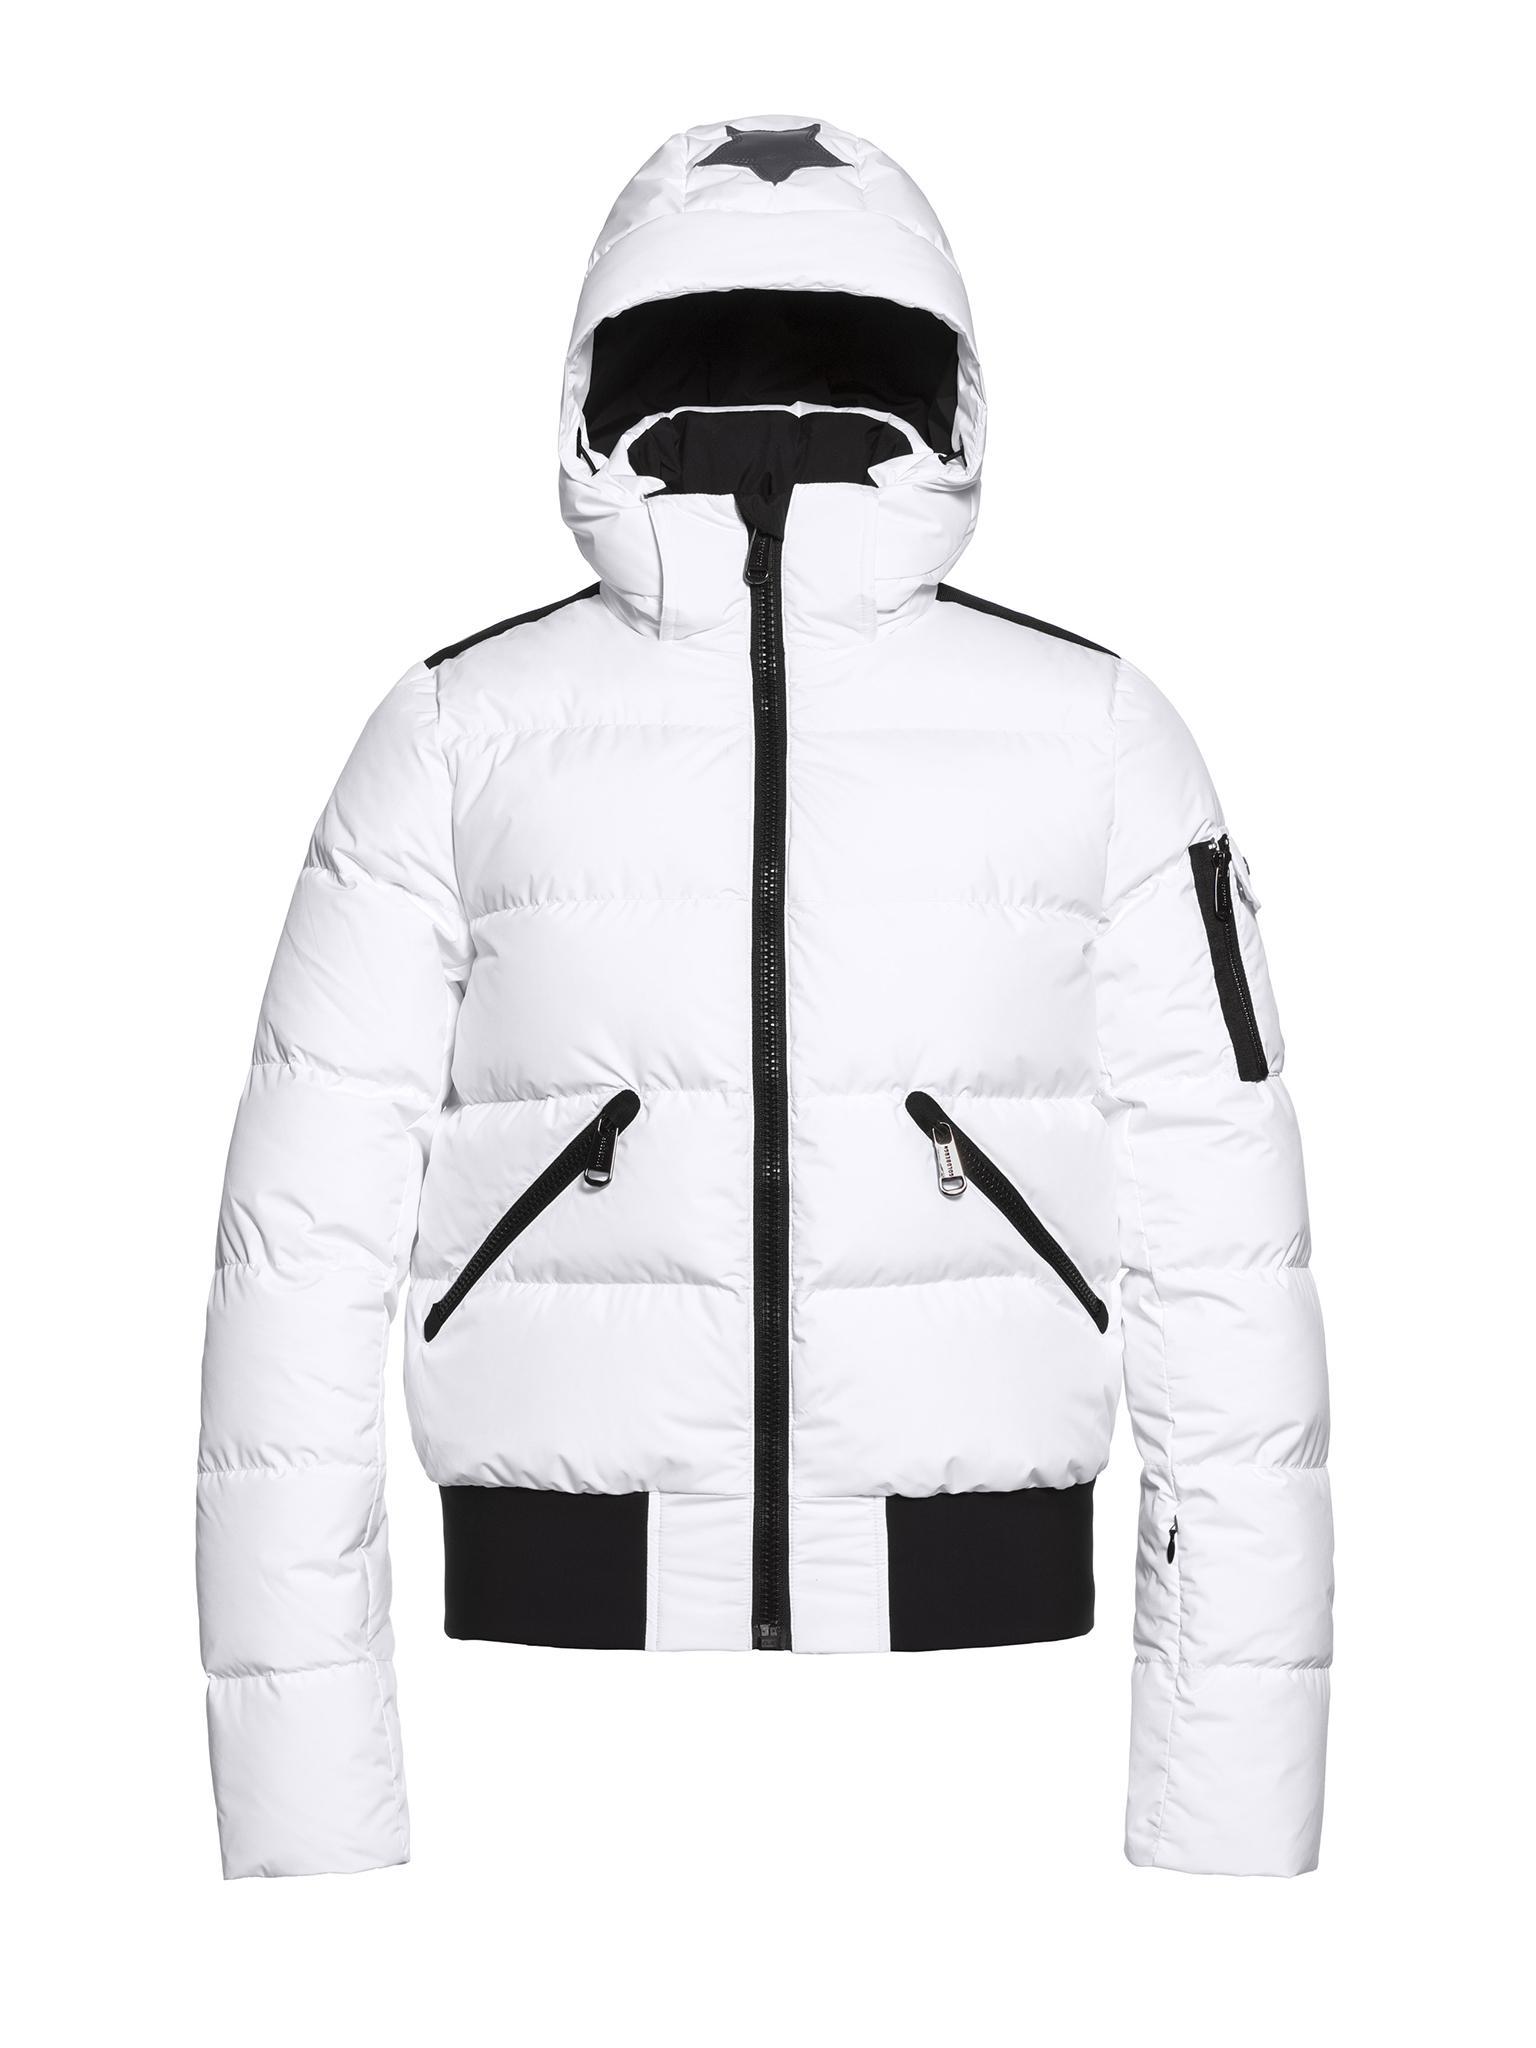 Witte dames winter/ski jas Goldbergh - Kohana - GB02-13-193-800